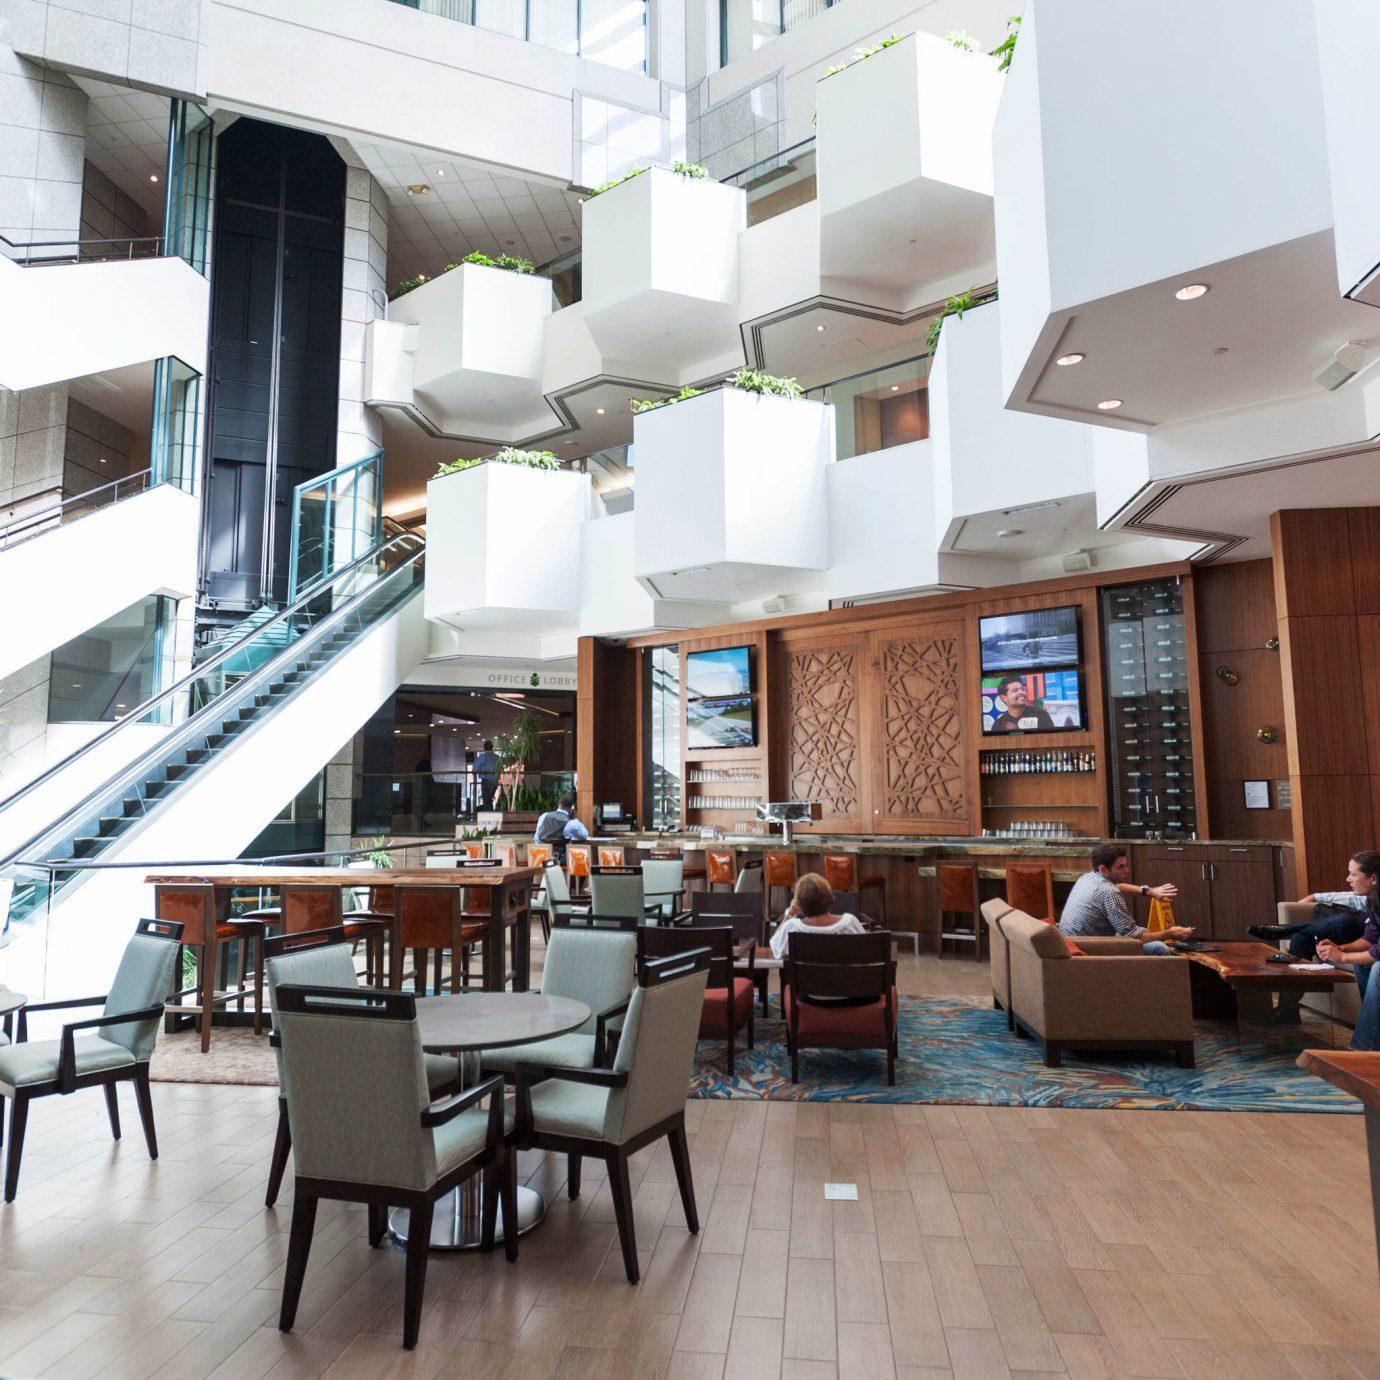 chair property building condominium Lobby restaurant cafeteria